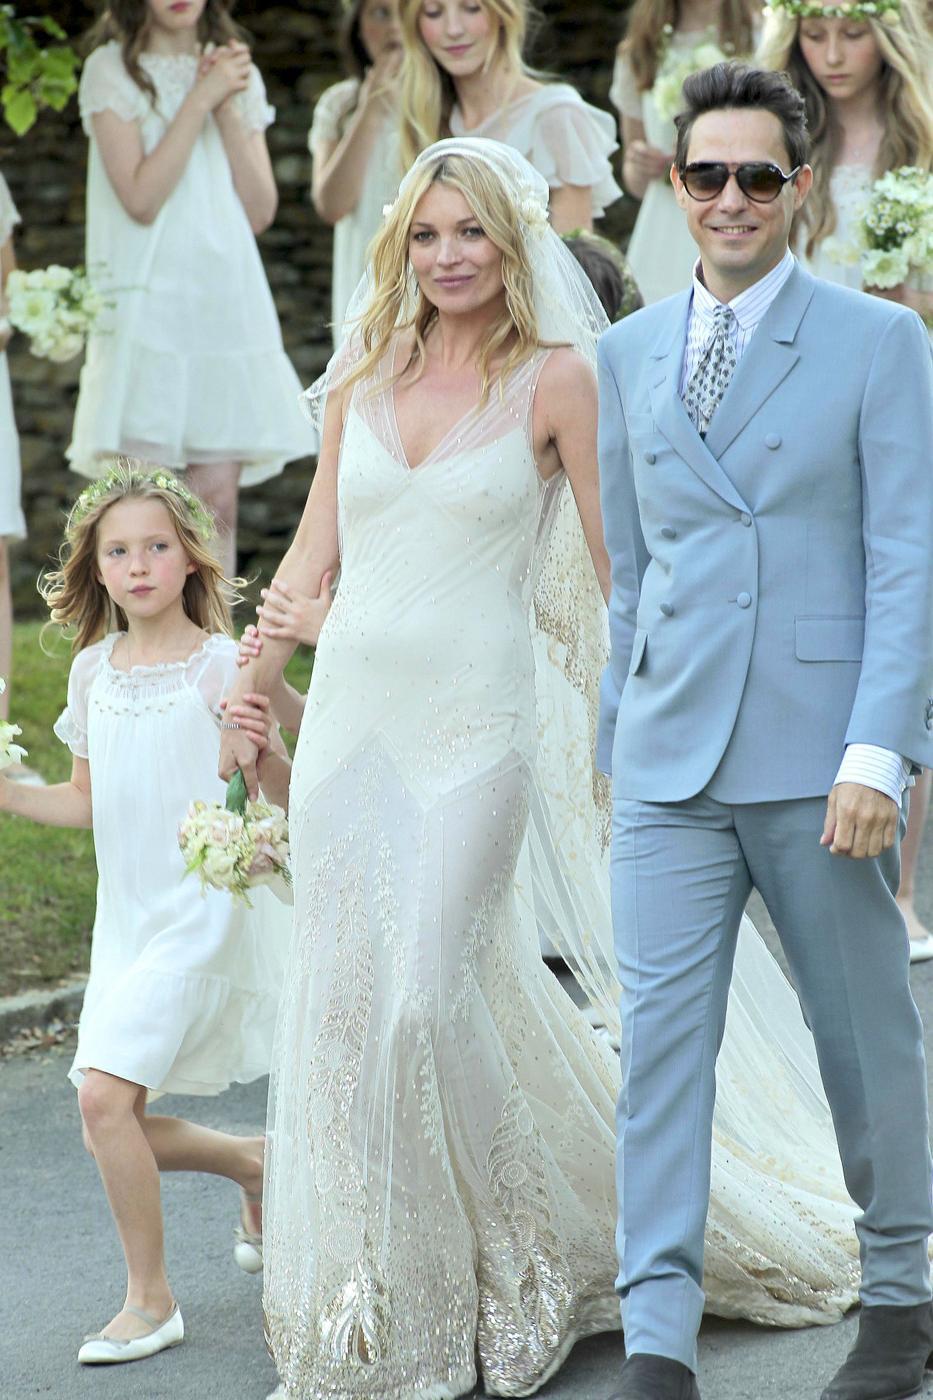 Fancy Kate Middleton Bridesmaid Dress Gift - Colorful Wedding Dress ...